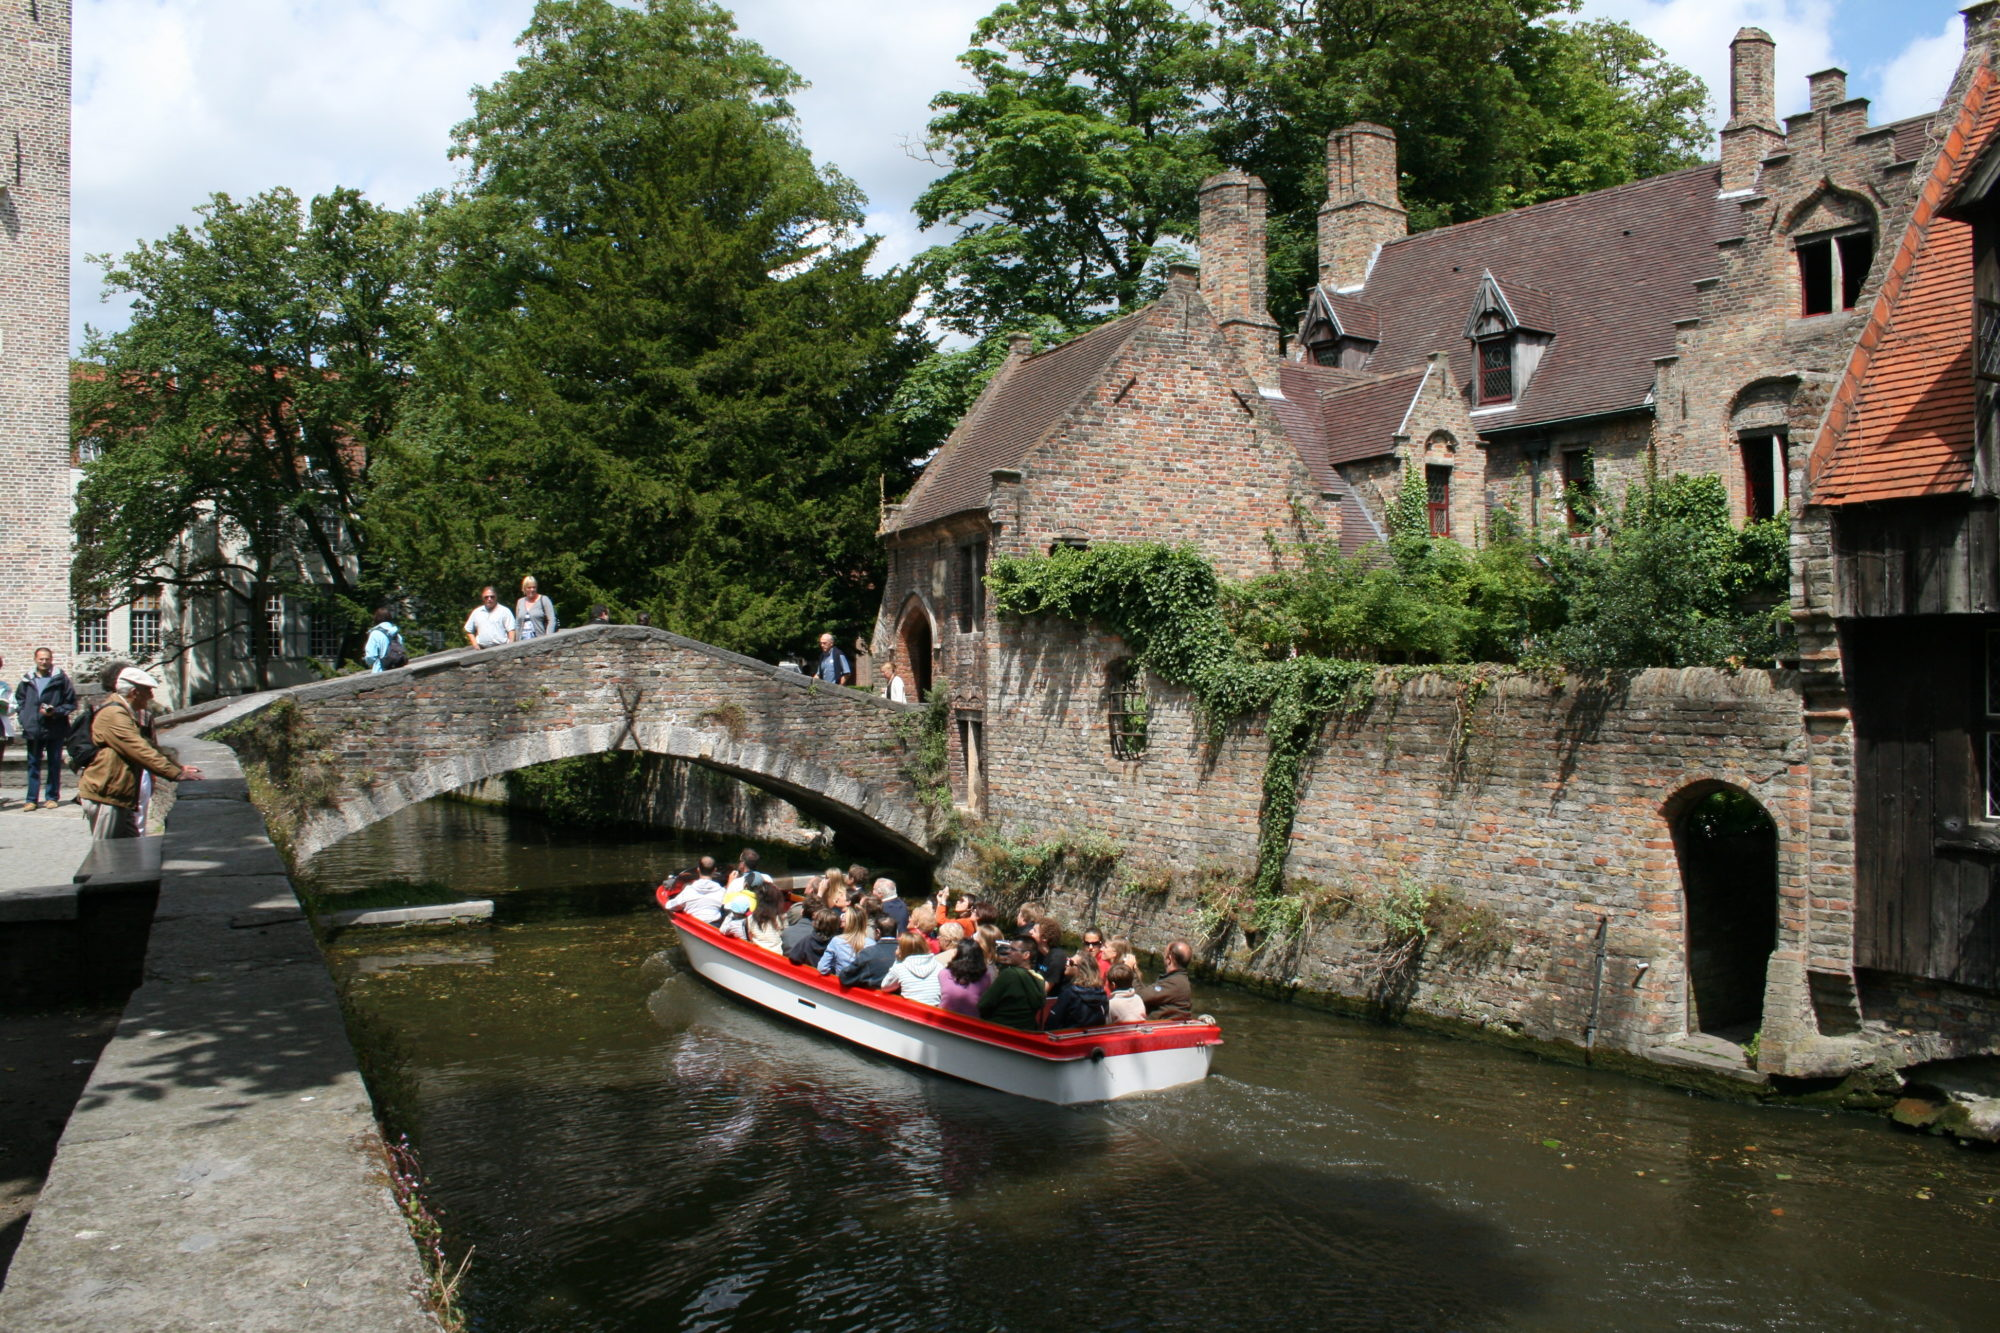 Bruges Brugge canals GO experience Belgica